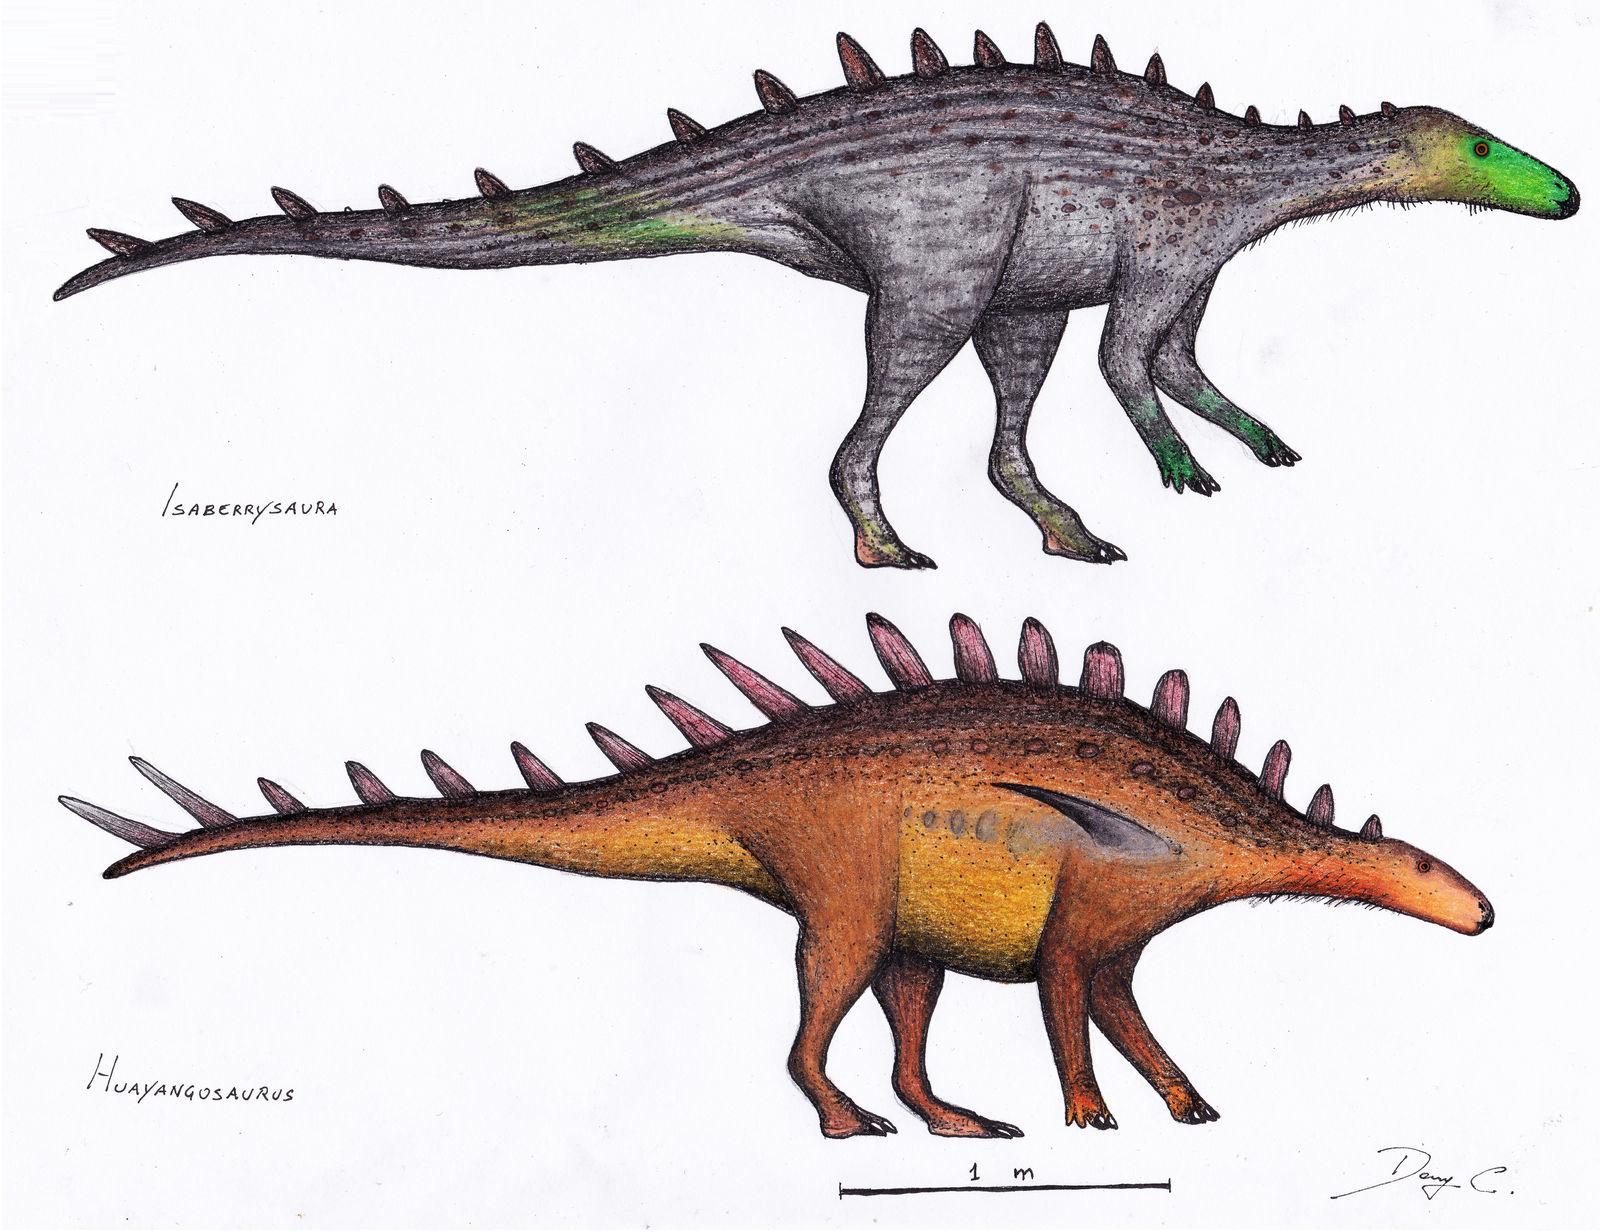 The birth of Stegosauria